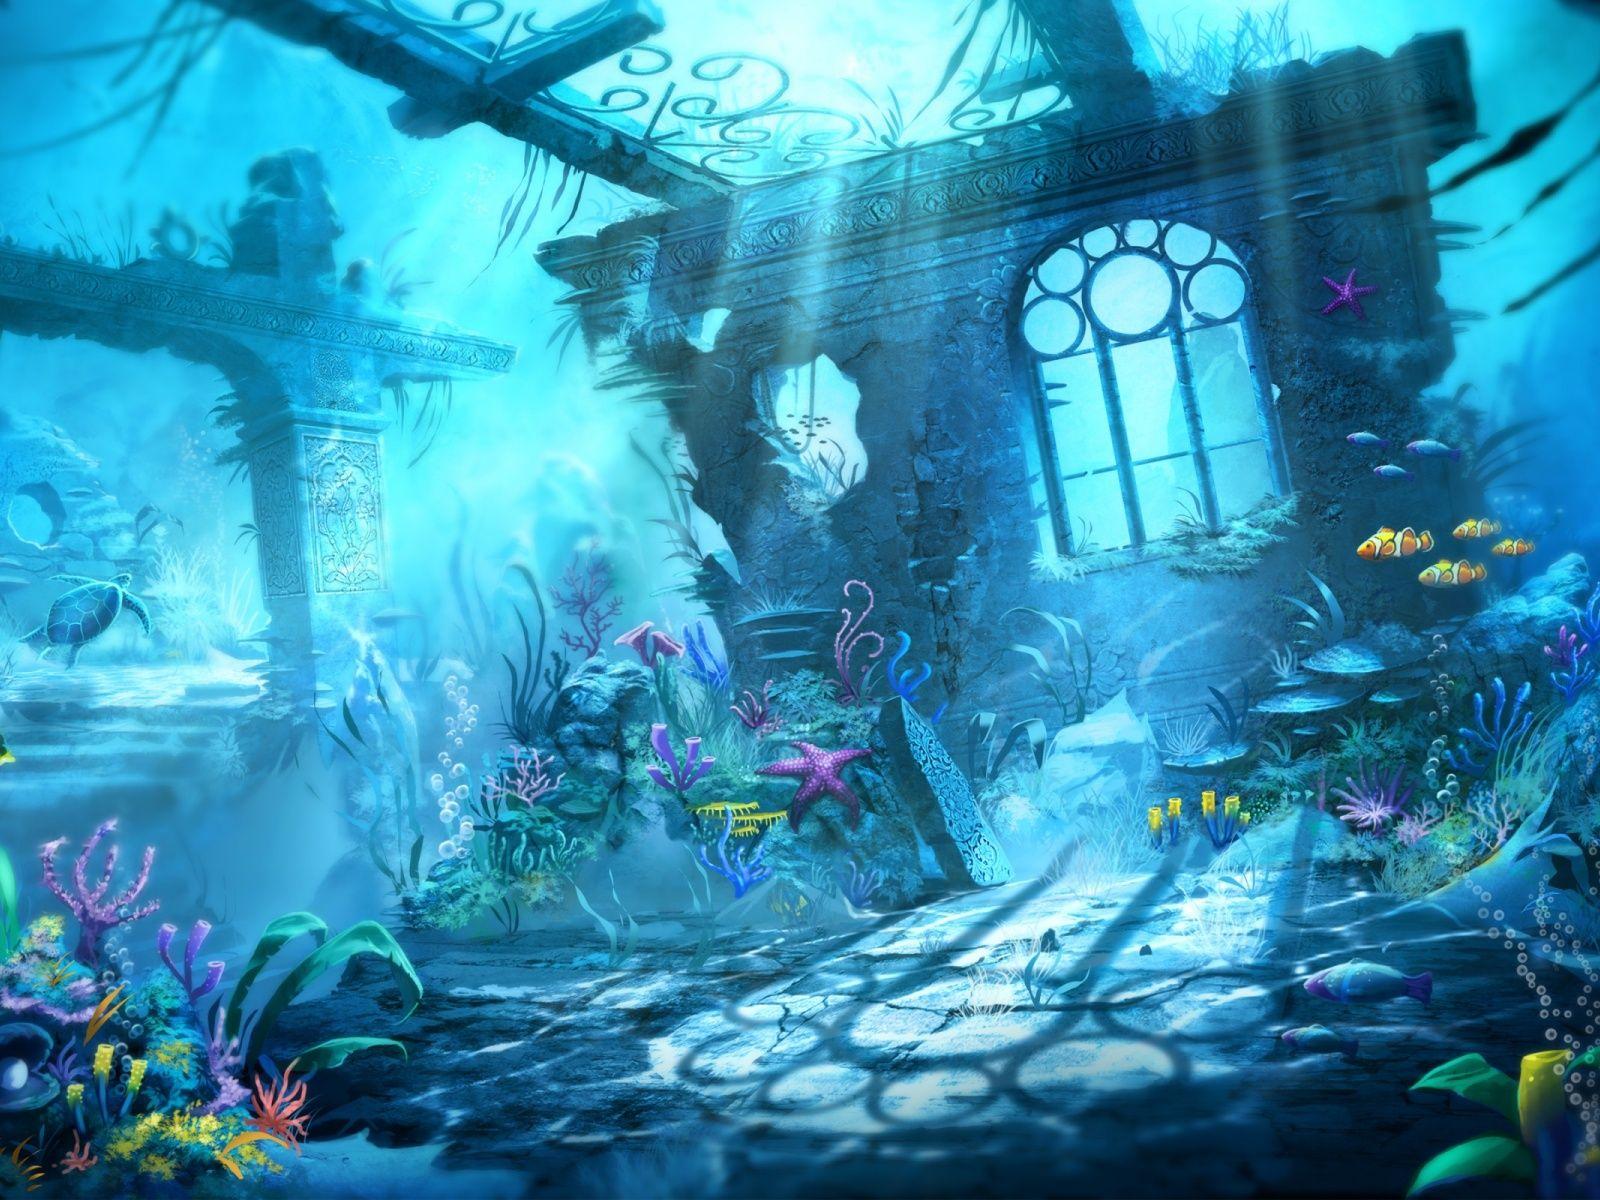 fantasy graphics Google Search Underwater wallpaper